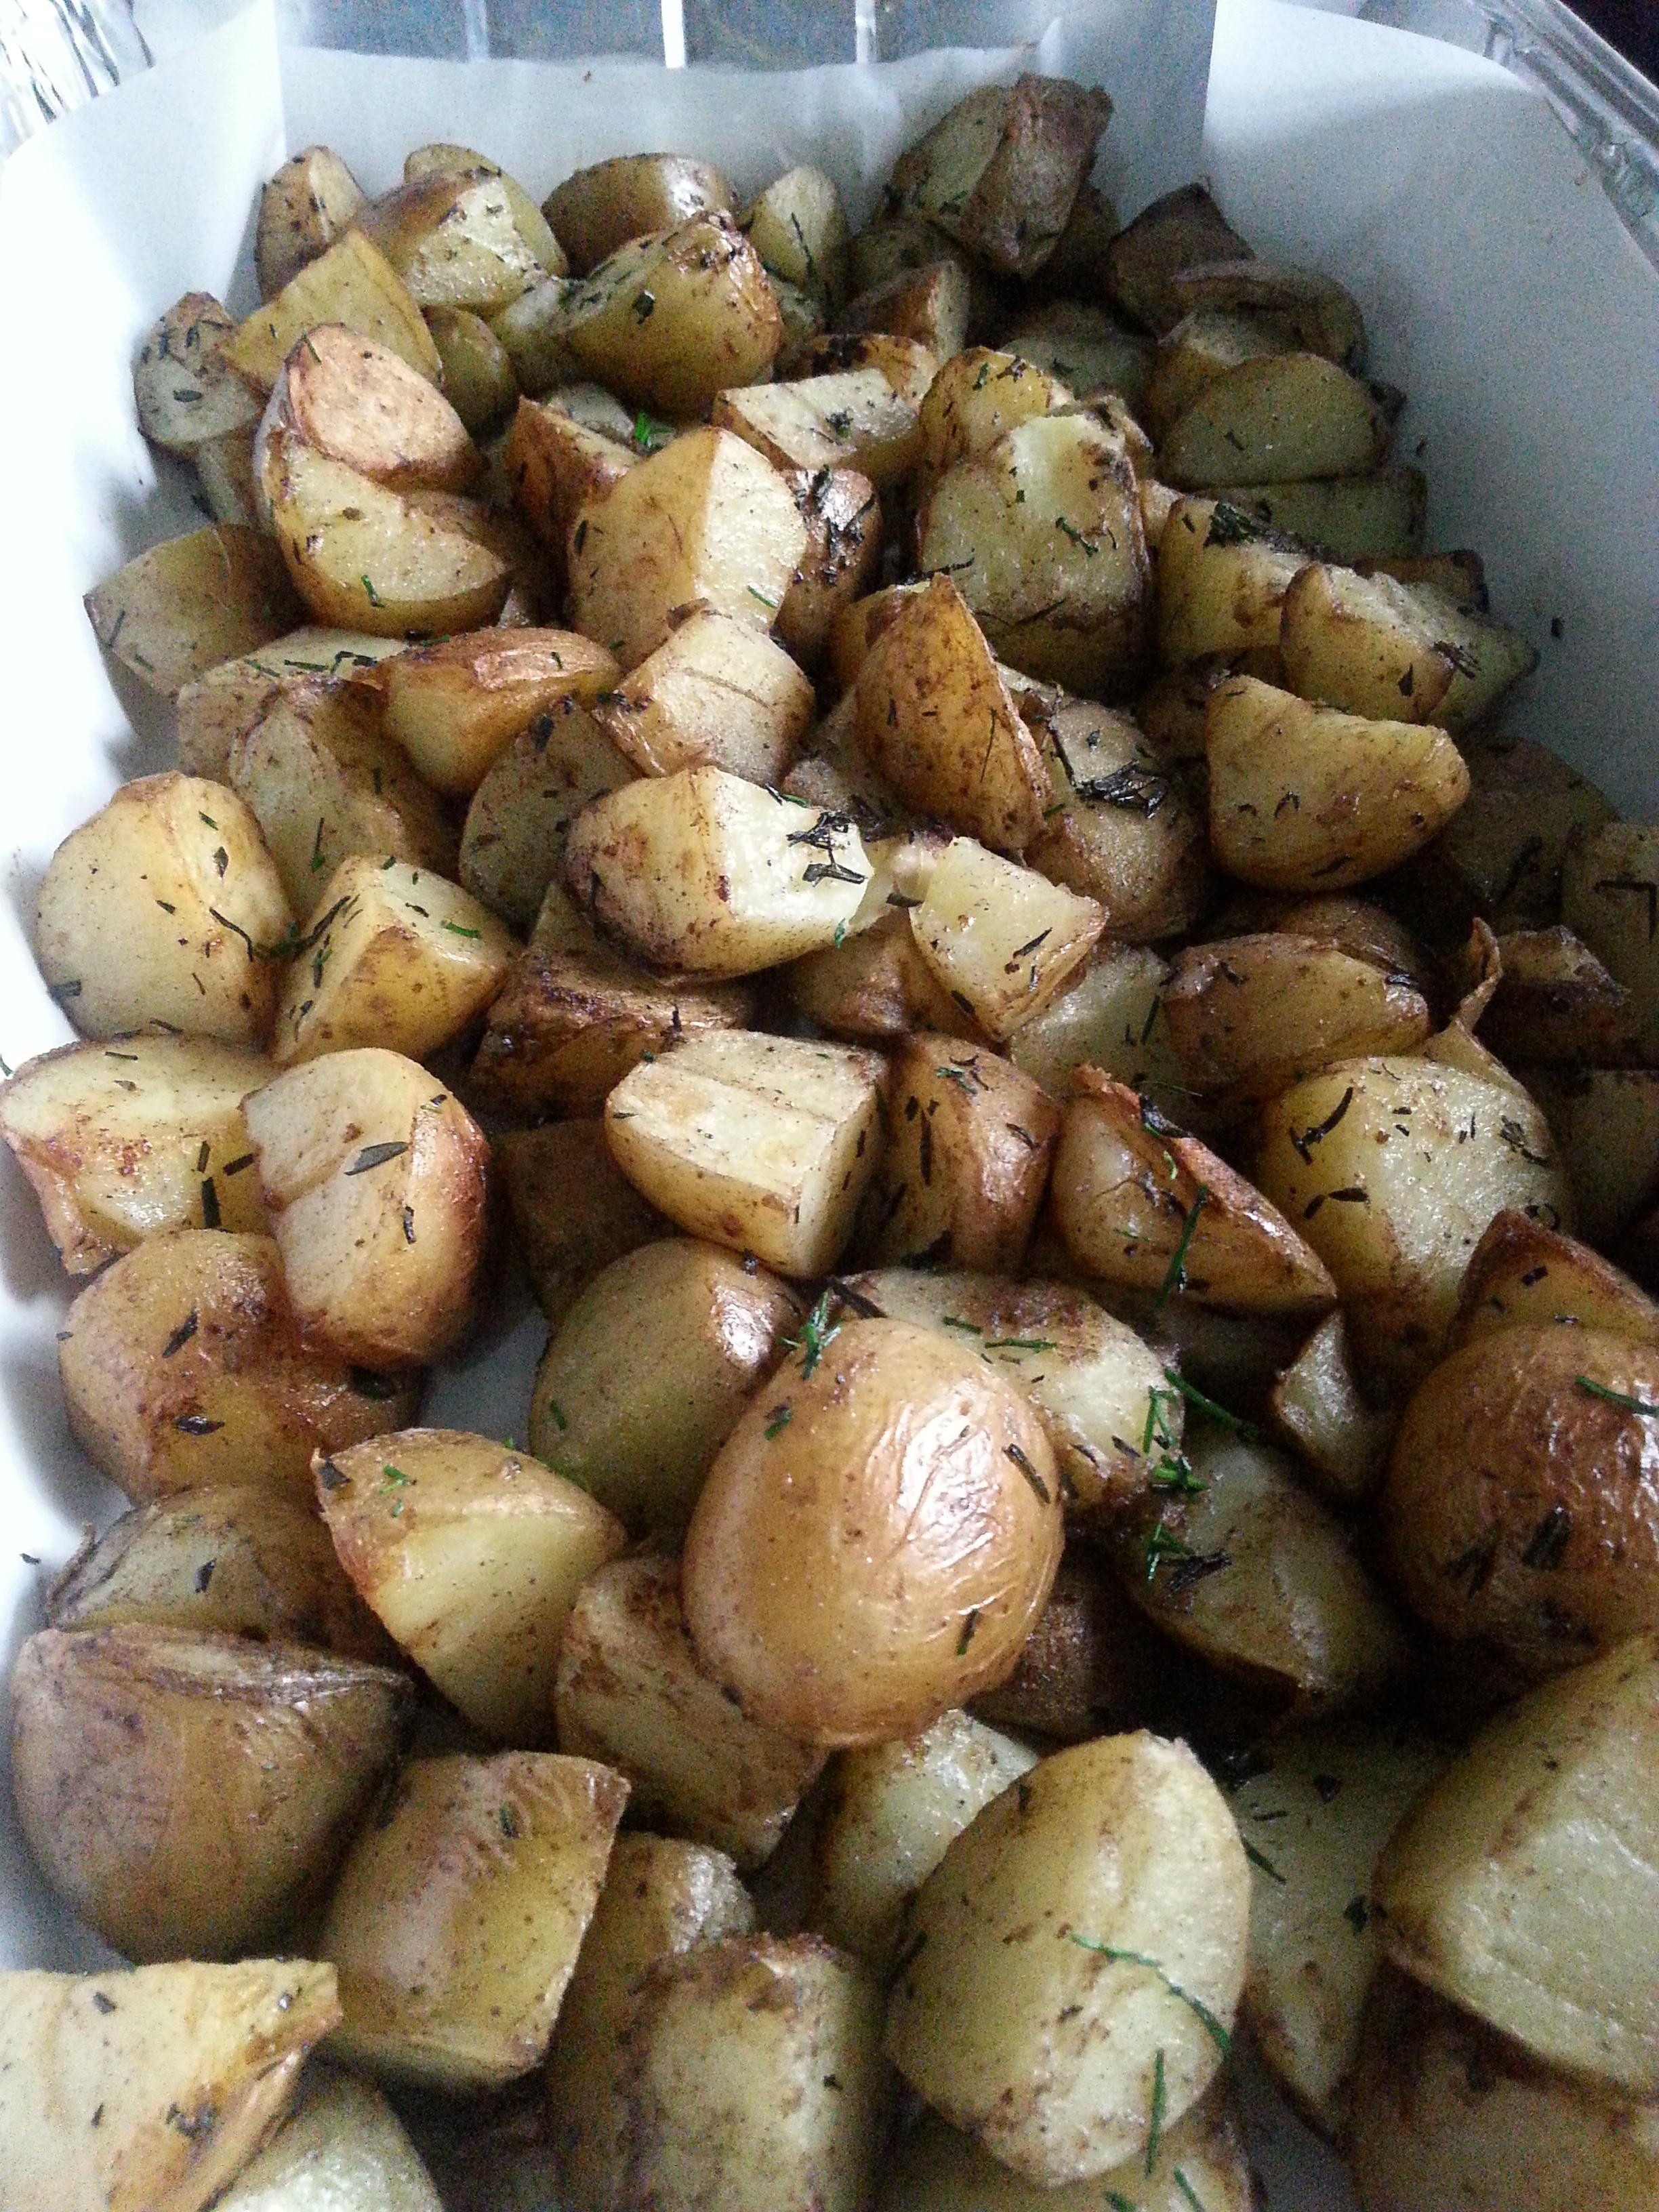 Pan Roasted Potatoes  pan roasted potatoes with rosemary